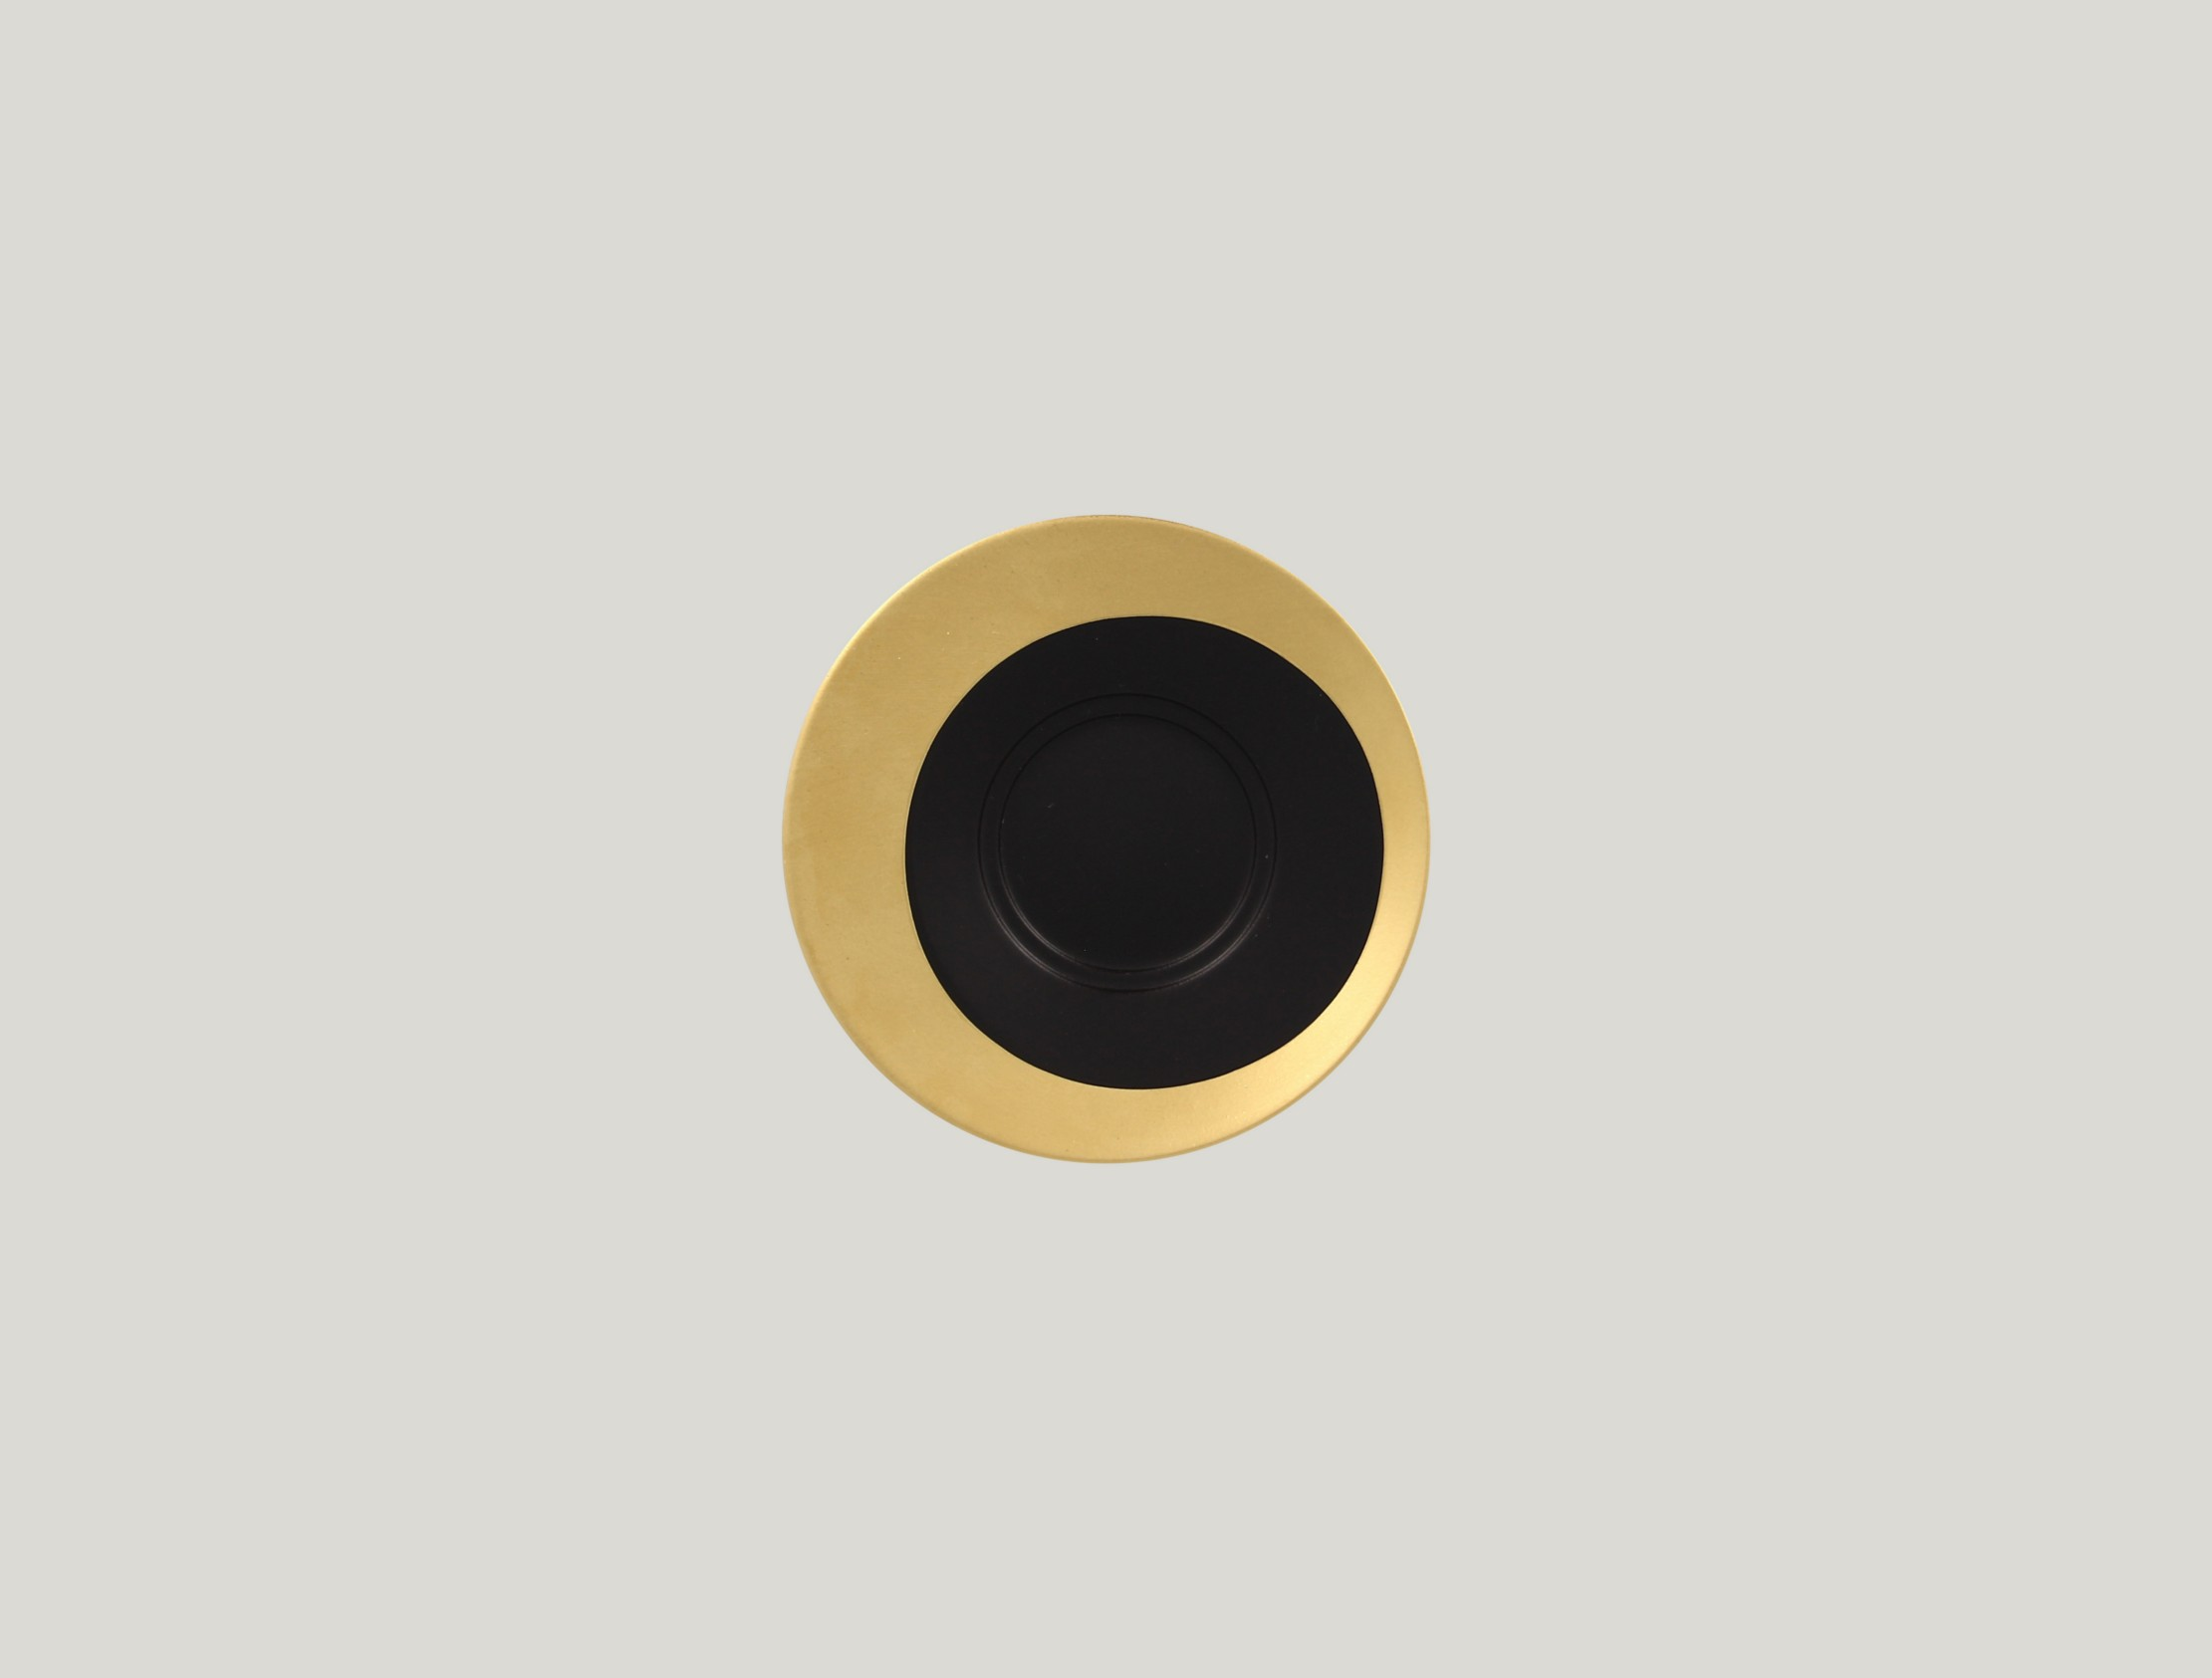 Podšálek - gold ANTIC